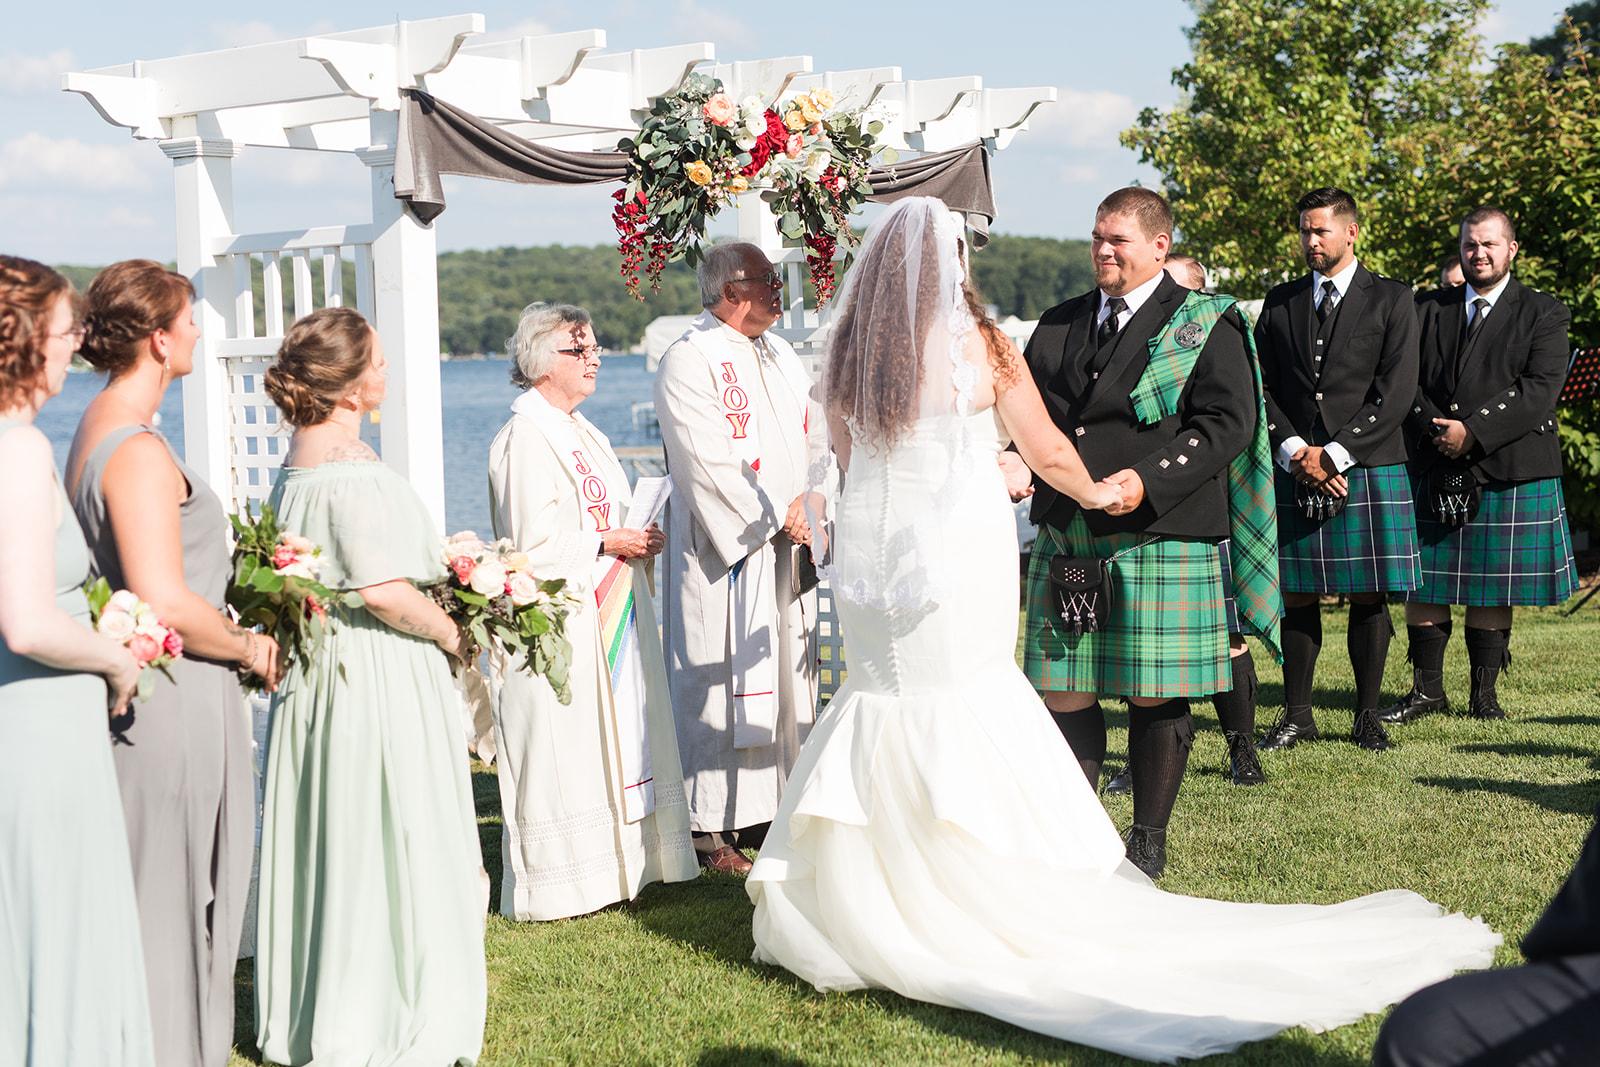 Scottish wedding ceremony during a Bay Pointe Inn wedding in Shelbyville, Michigan